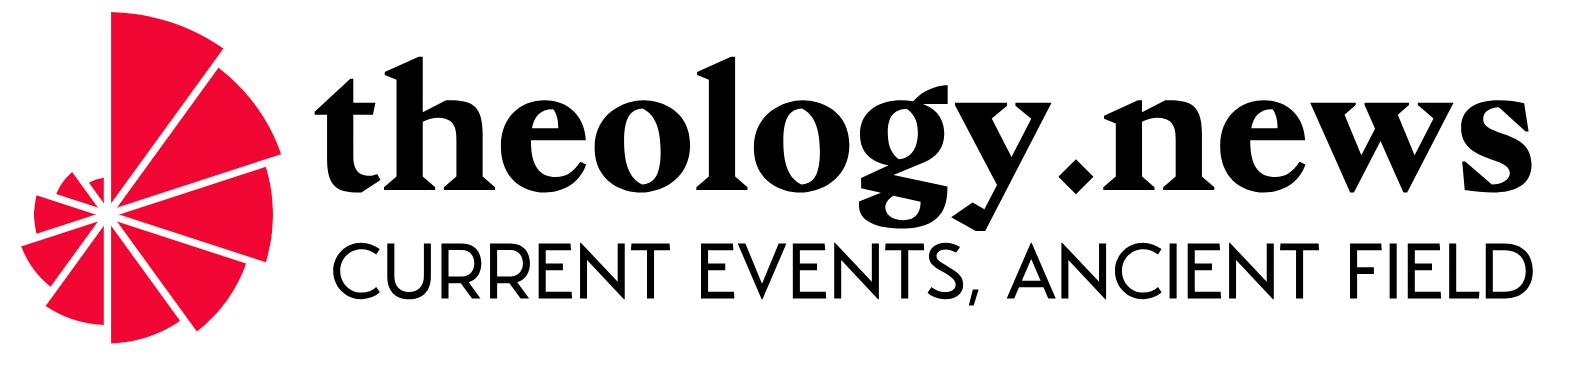 Main theology news logo